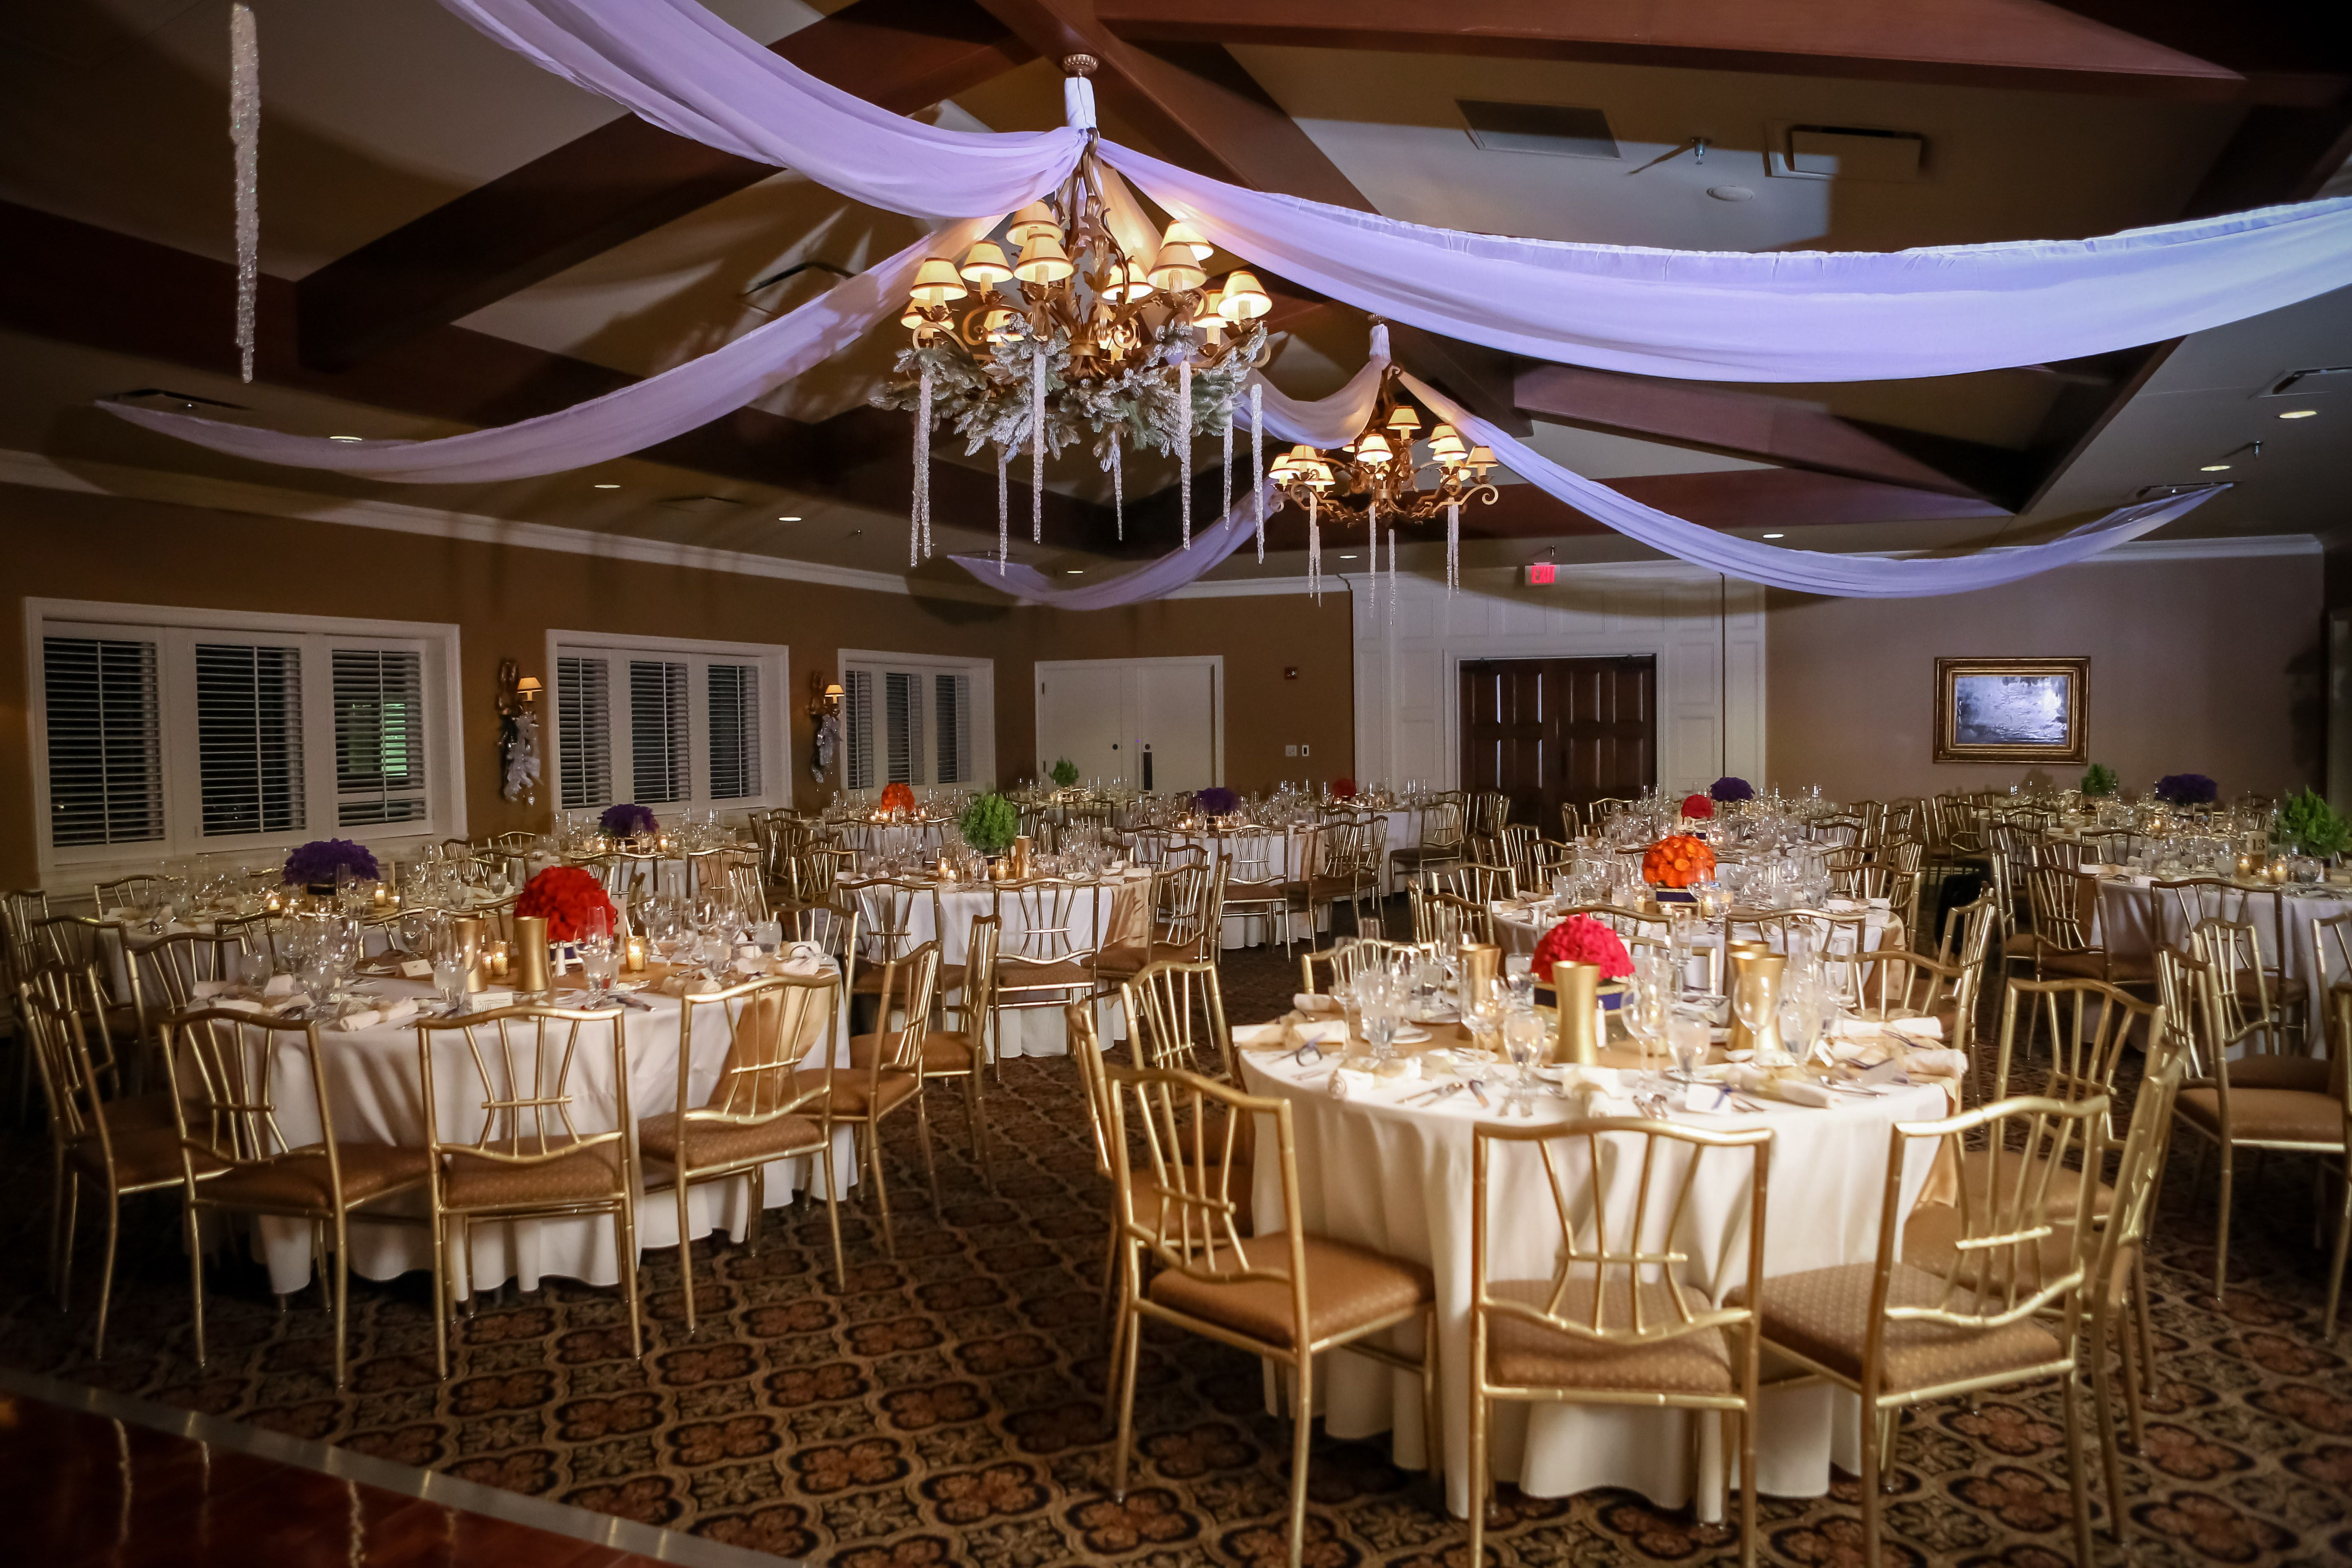 11 Best Evanston Golf Club Wedding Skokie Il Images On Pinterest Bodas Clubs And Receptions